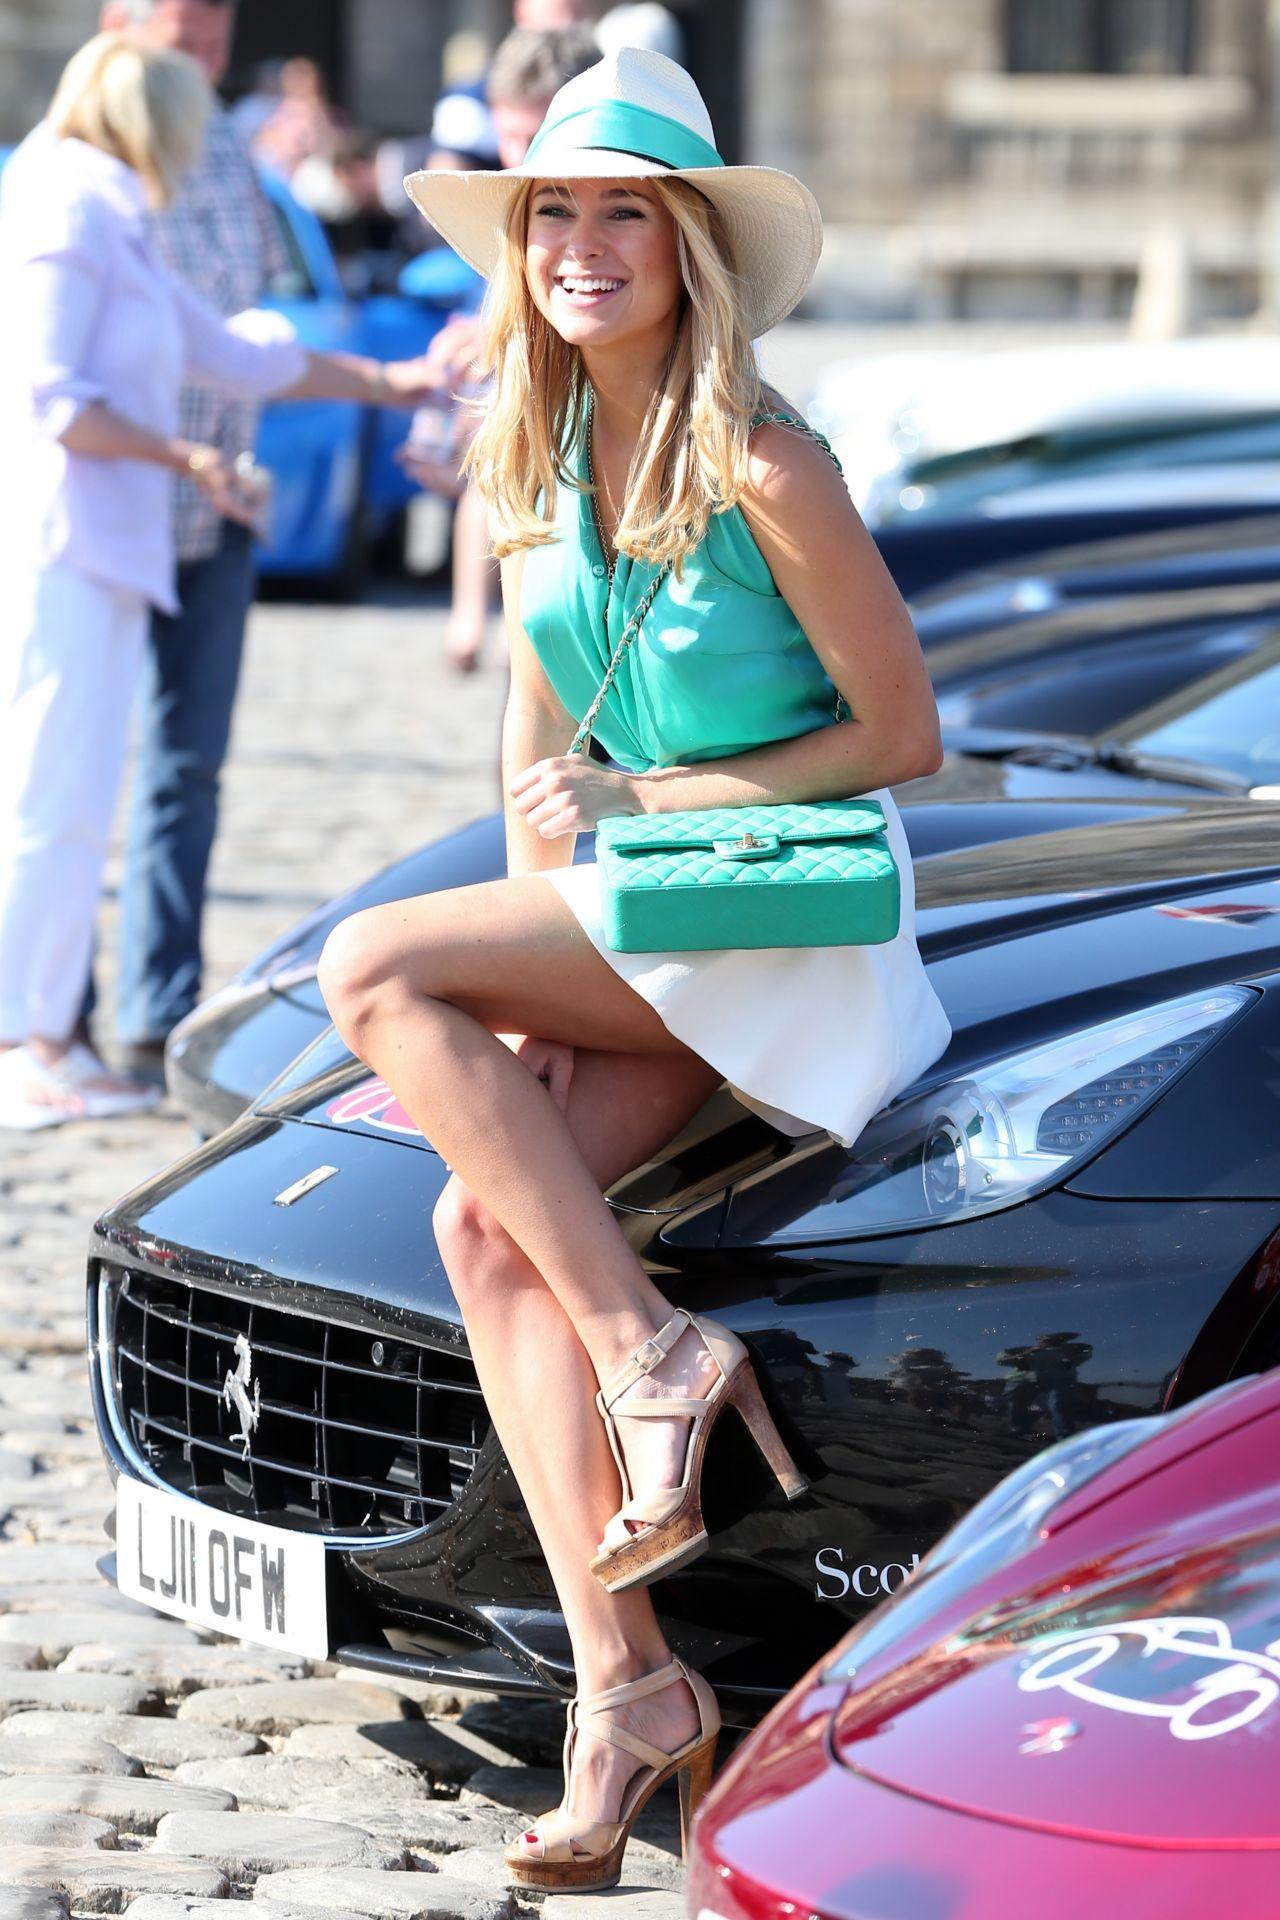 Kimberley Garner In Mini Skirt At The Grand Tour Race In